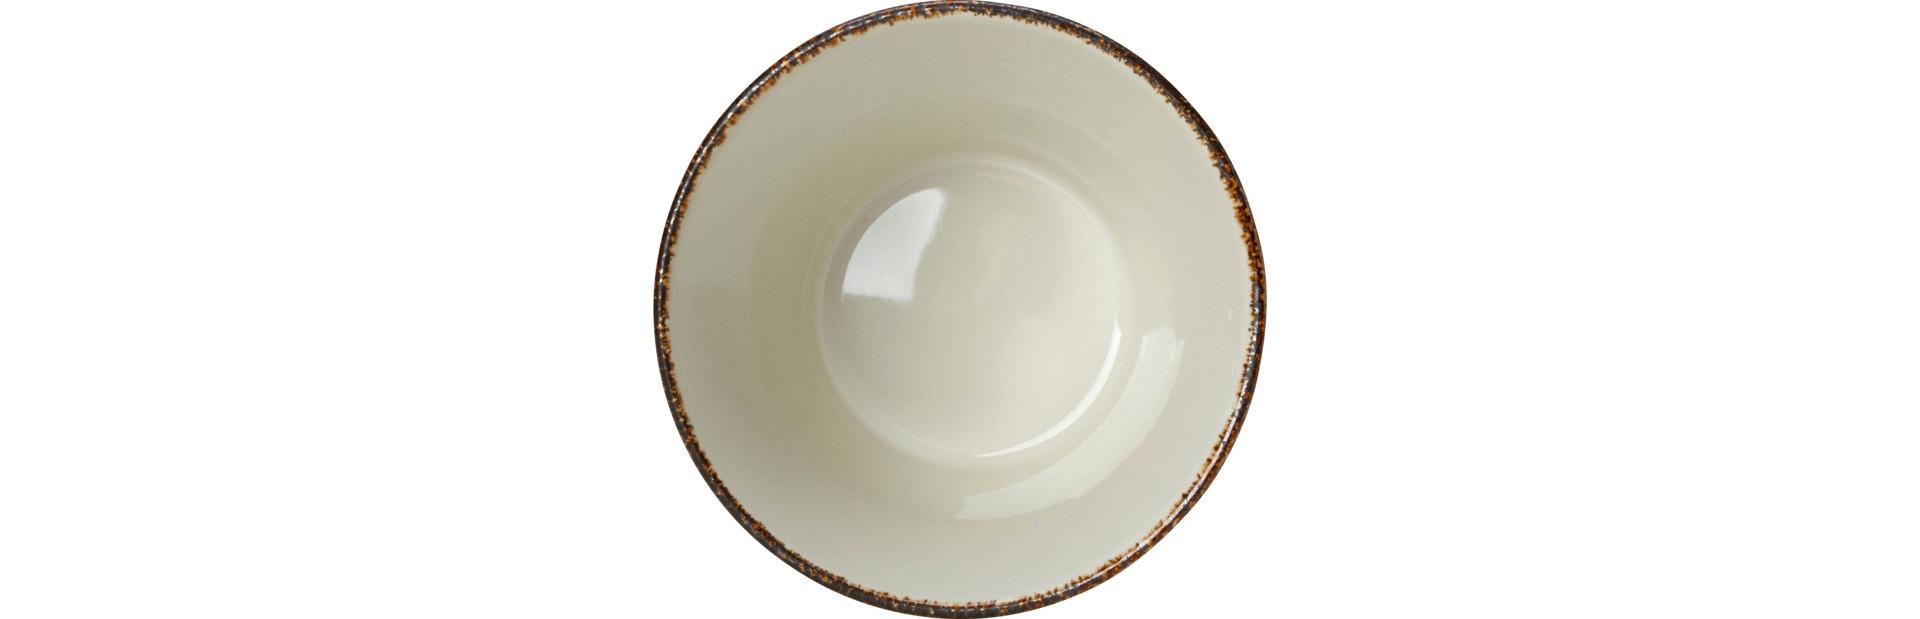 Brown Dapple, Bowl stapelbar ø 115 mm / 0,43 l